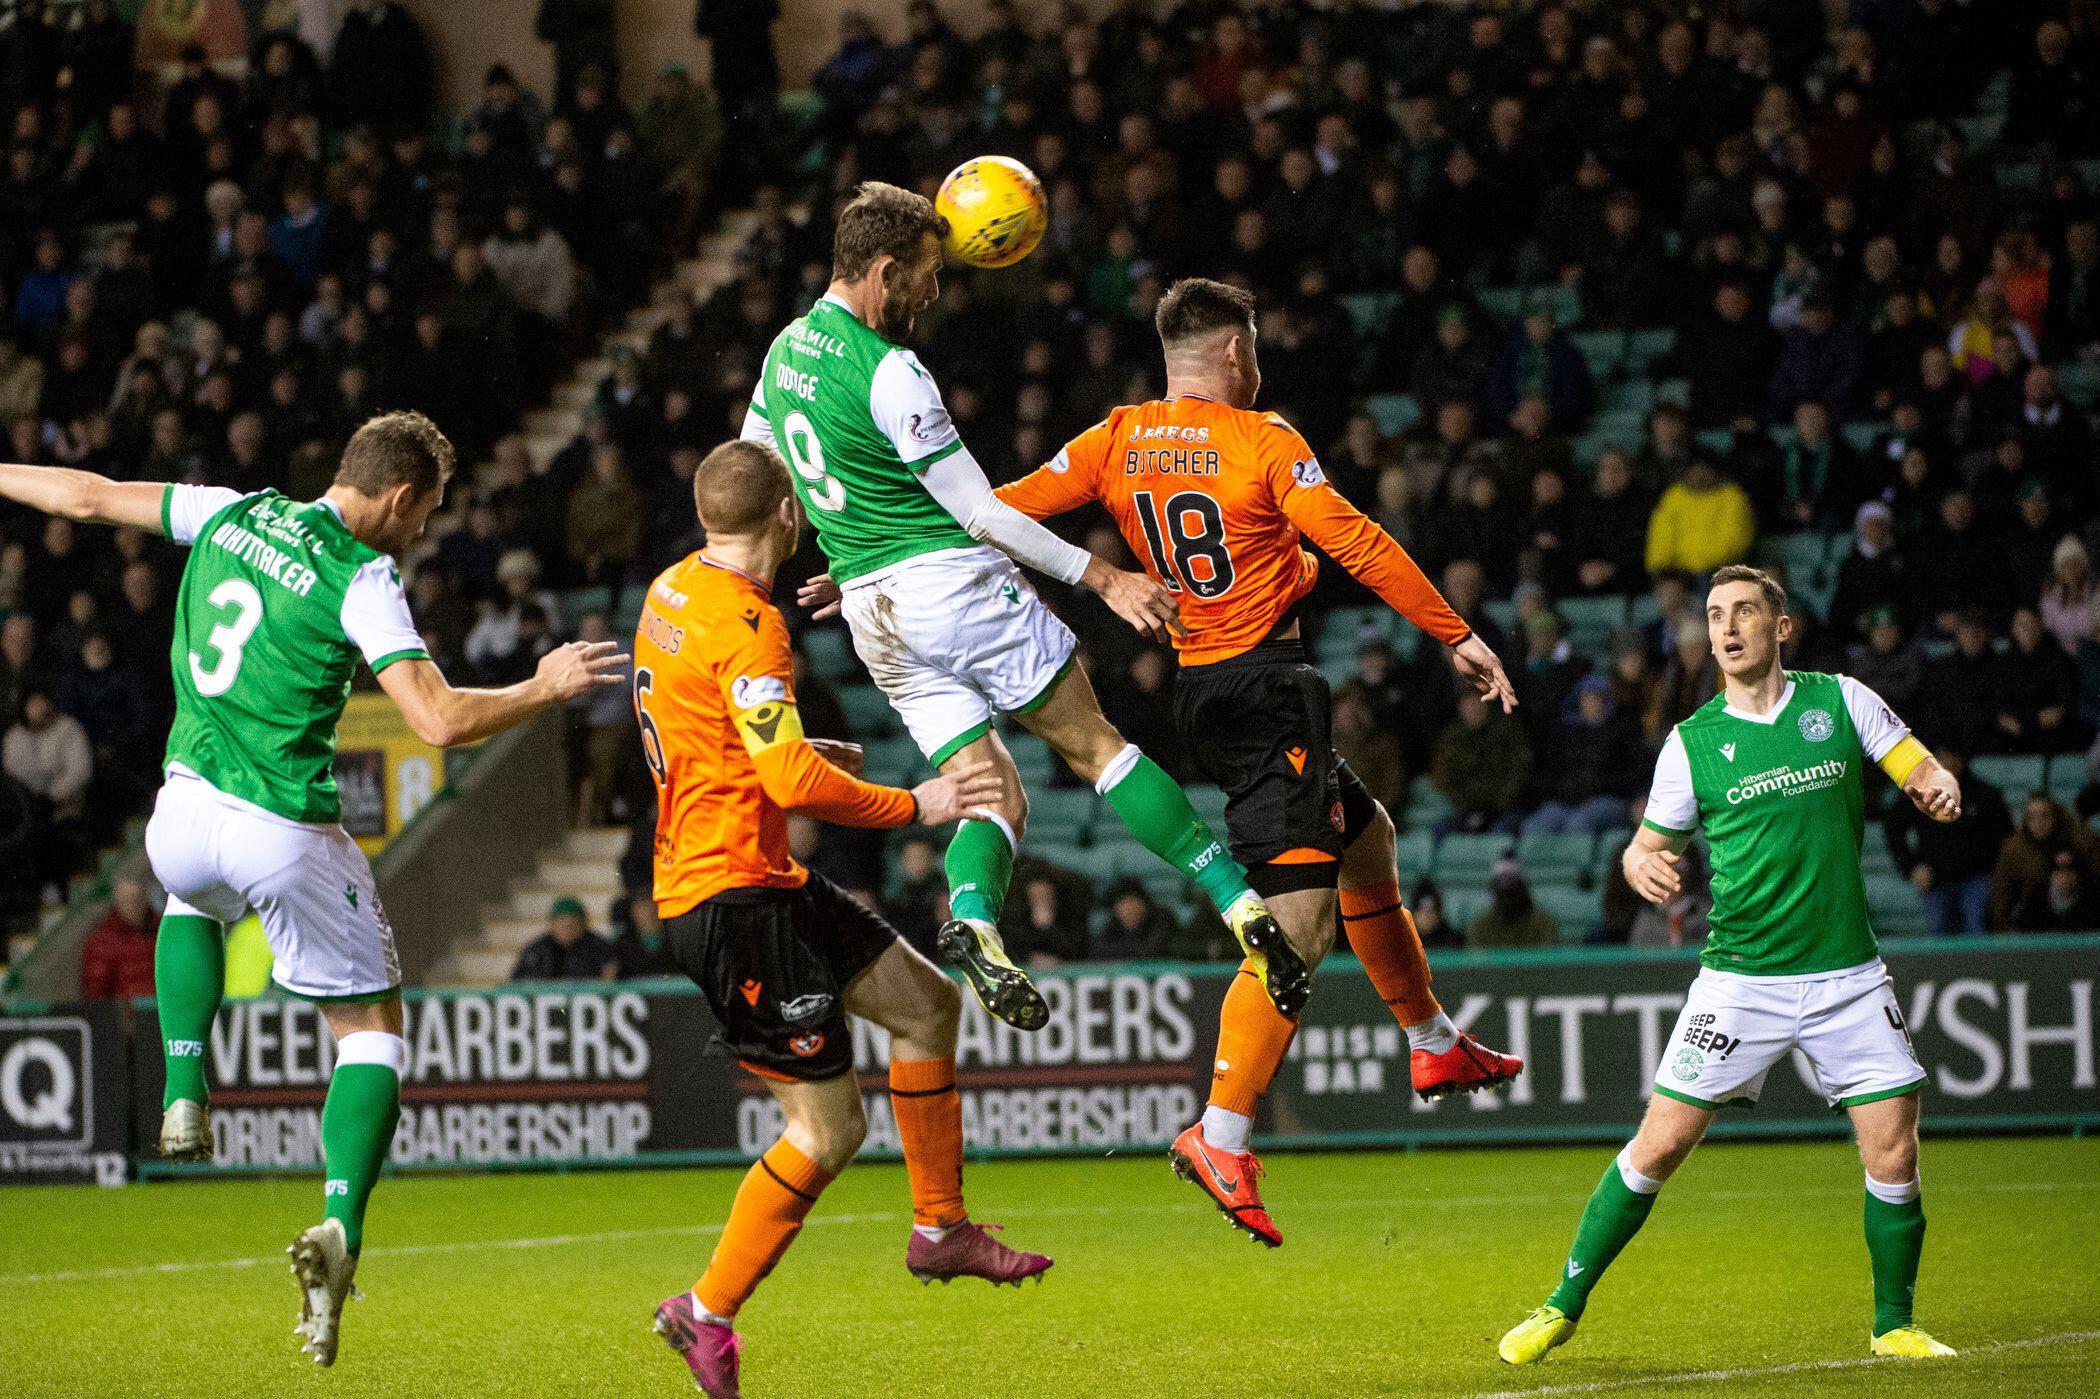 Hibernian 4, Dundee United 2: Christian Doidge seals Scottish Cup win